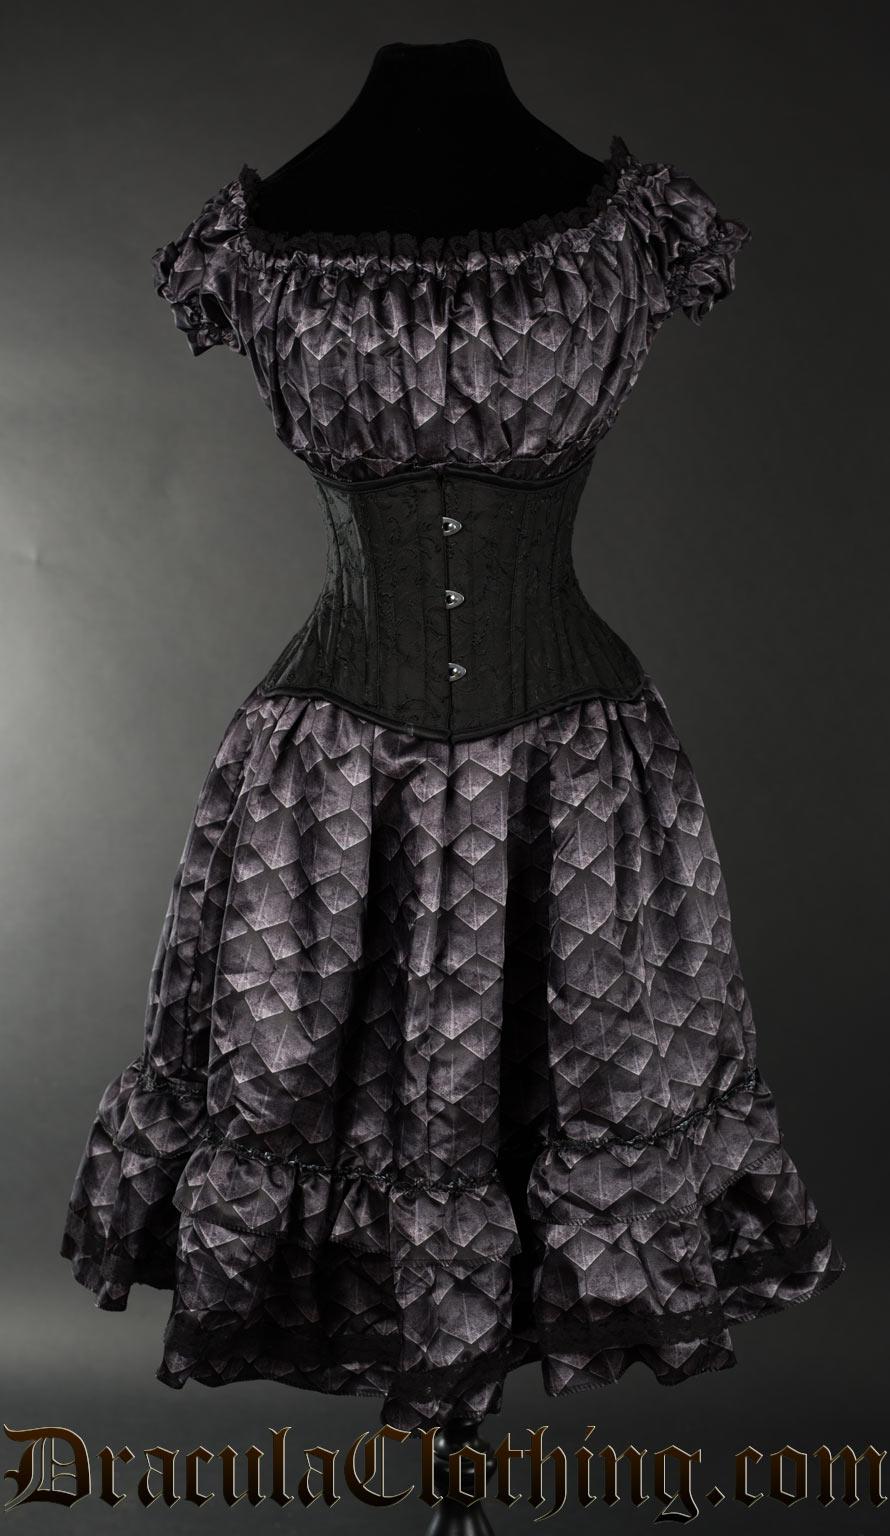 Dragon Scale Gothabilly Dress